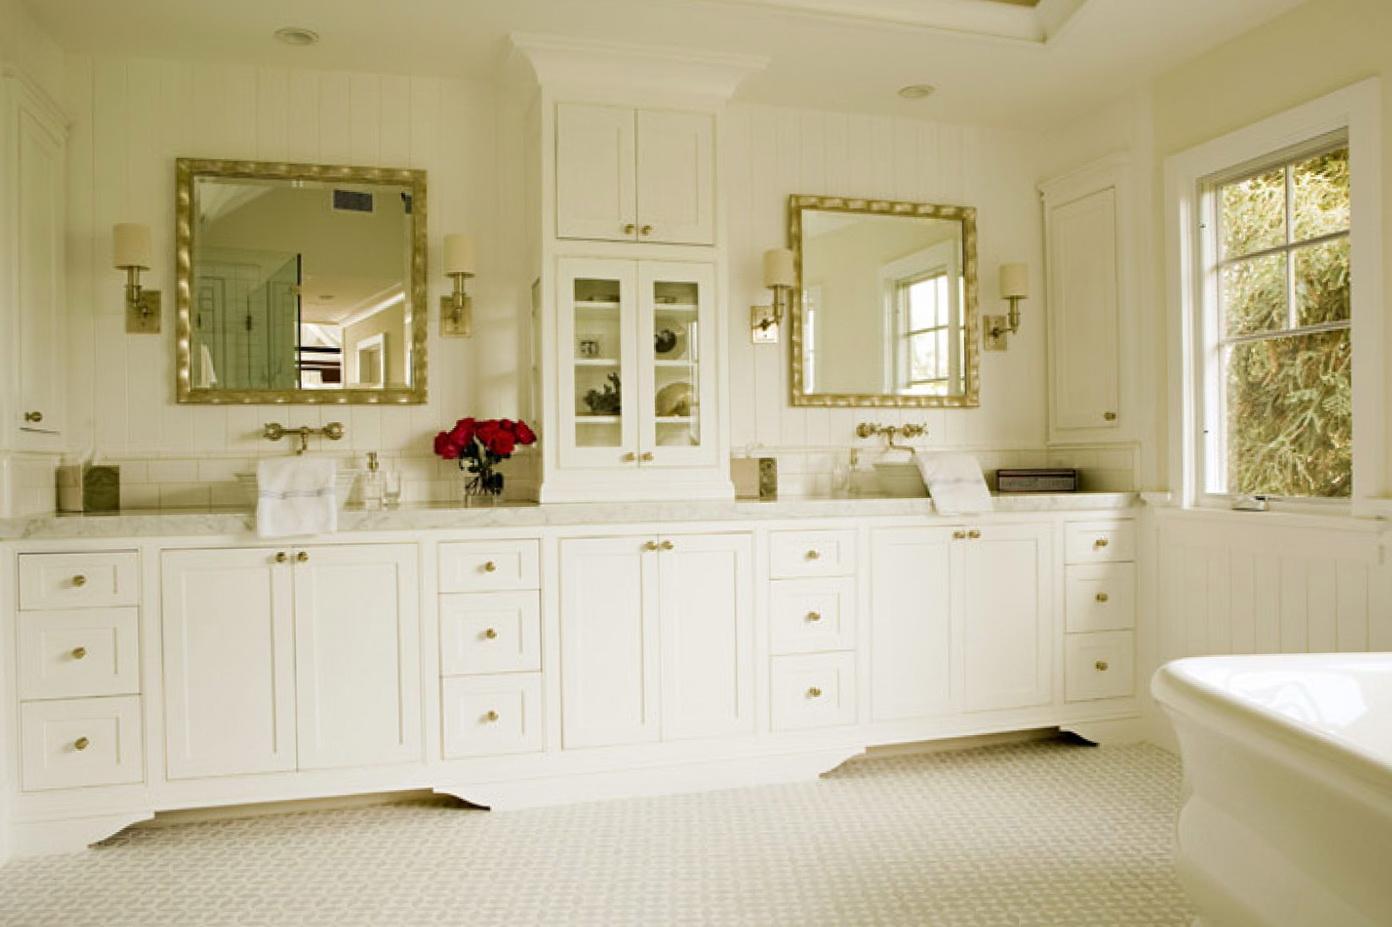 Double Bathroom Vanity With Hutch | Home Design Ideas